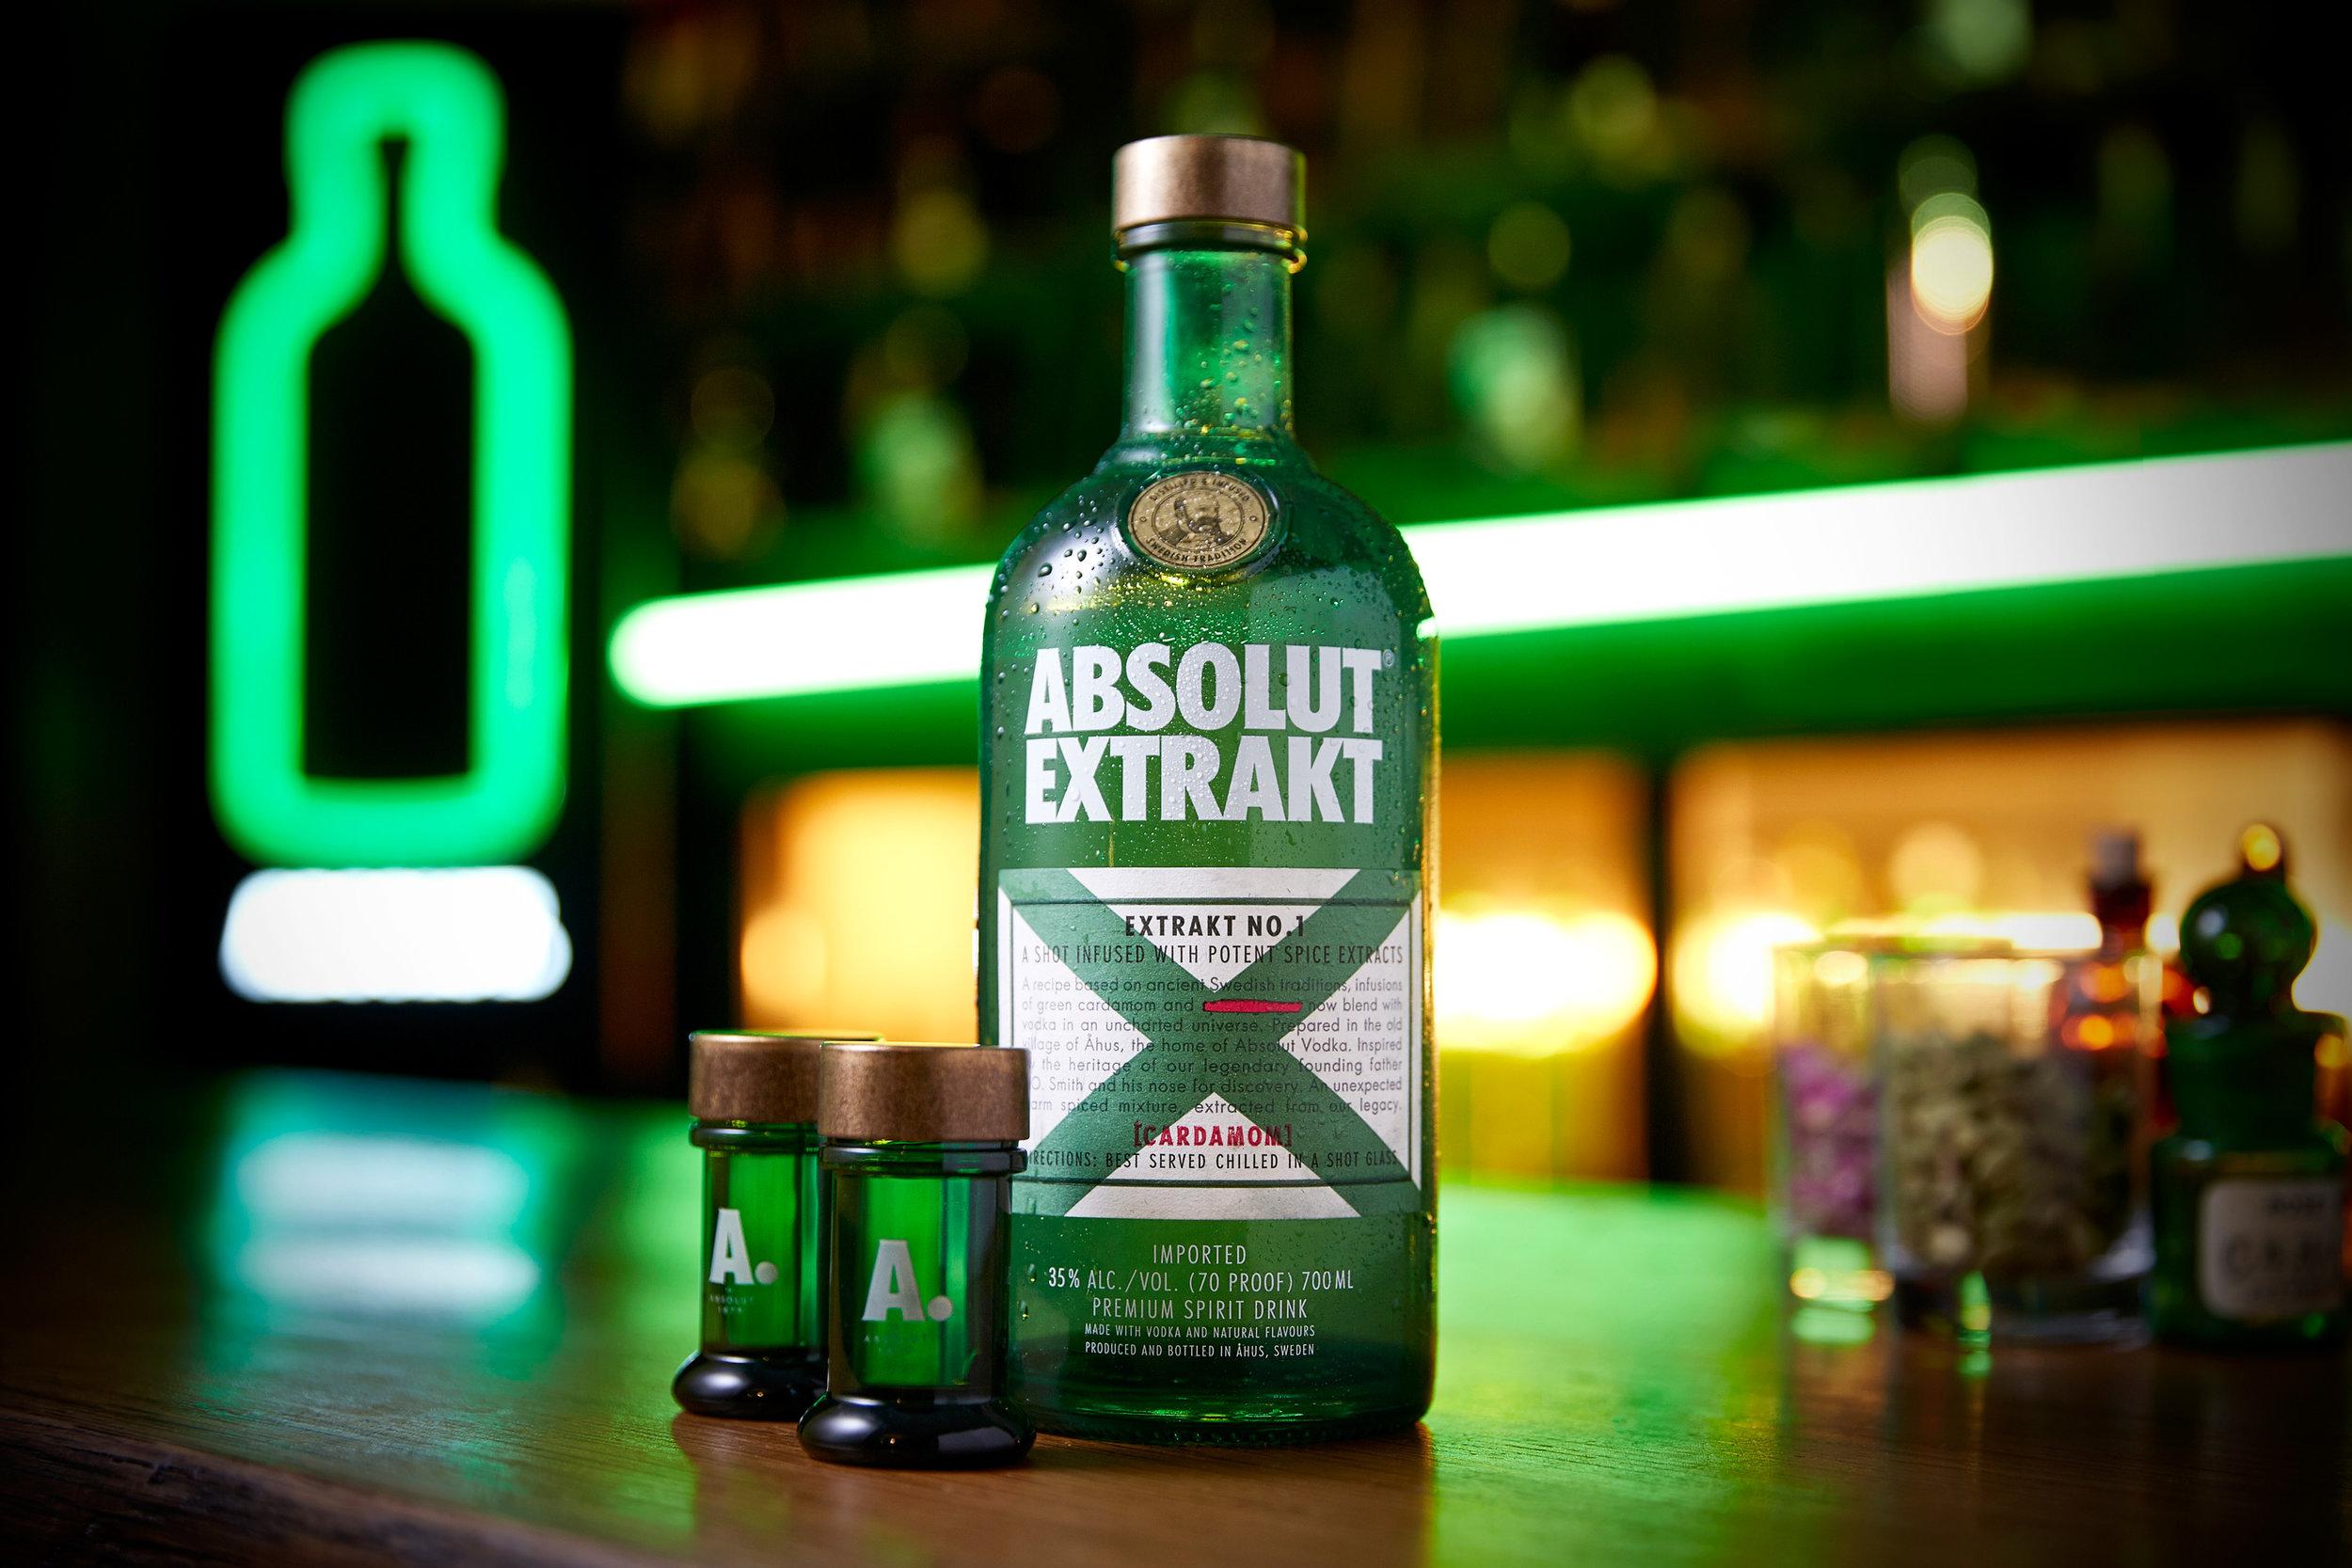 Absolut_Extrakt_drink_photography.jpg